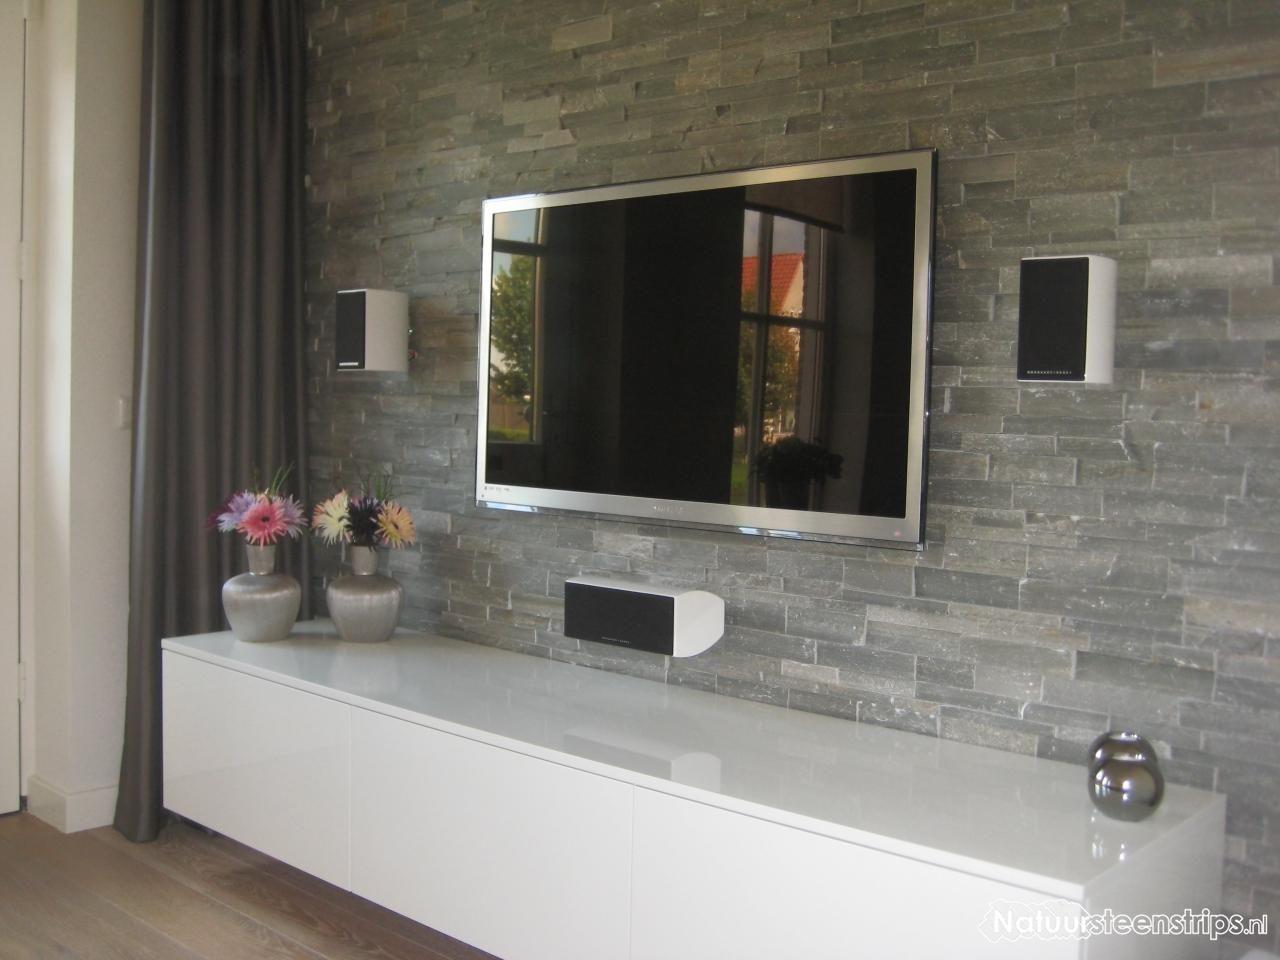 Steenstrip woonkamer | Home | Pinterest | Living rooms, Interiors ...